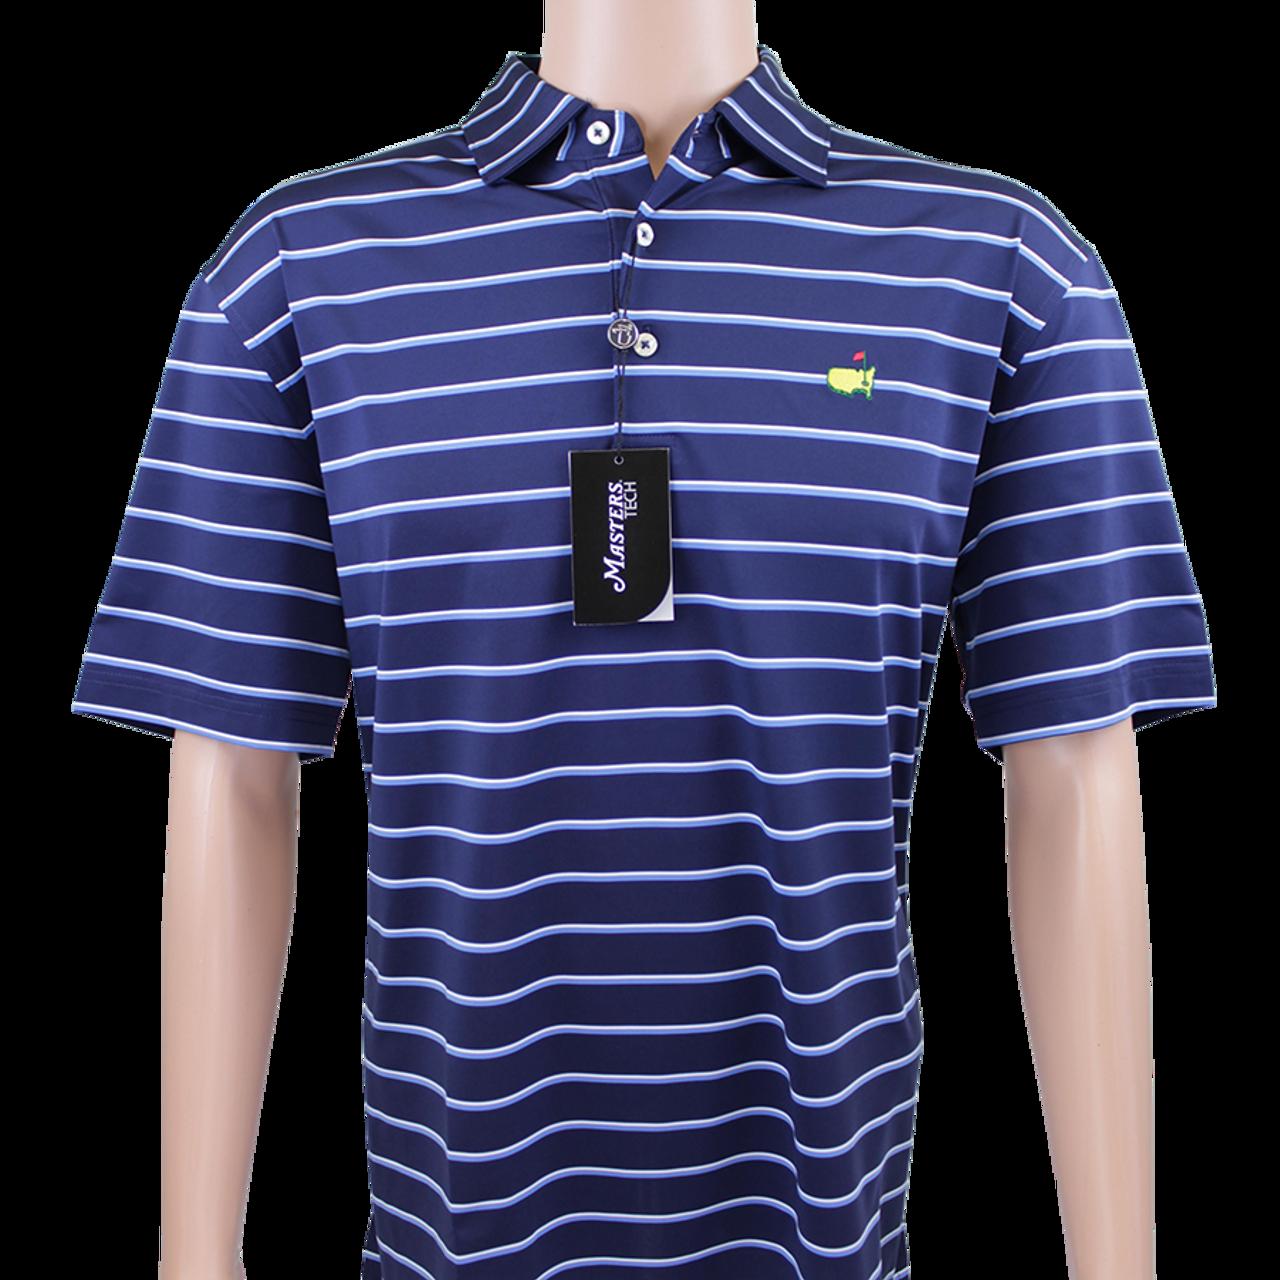 d99daa3e79b Masters Navy   White Blue Striped Performance Tech Golf Shirt